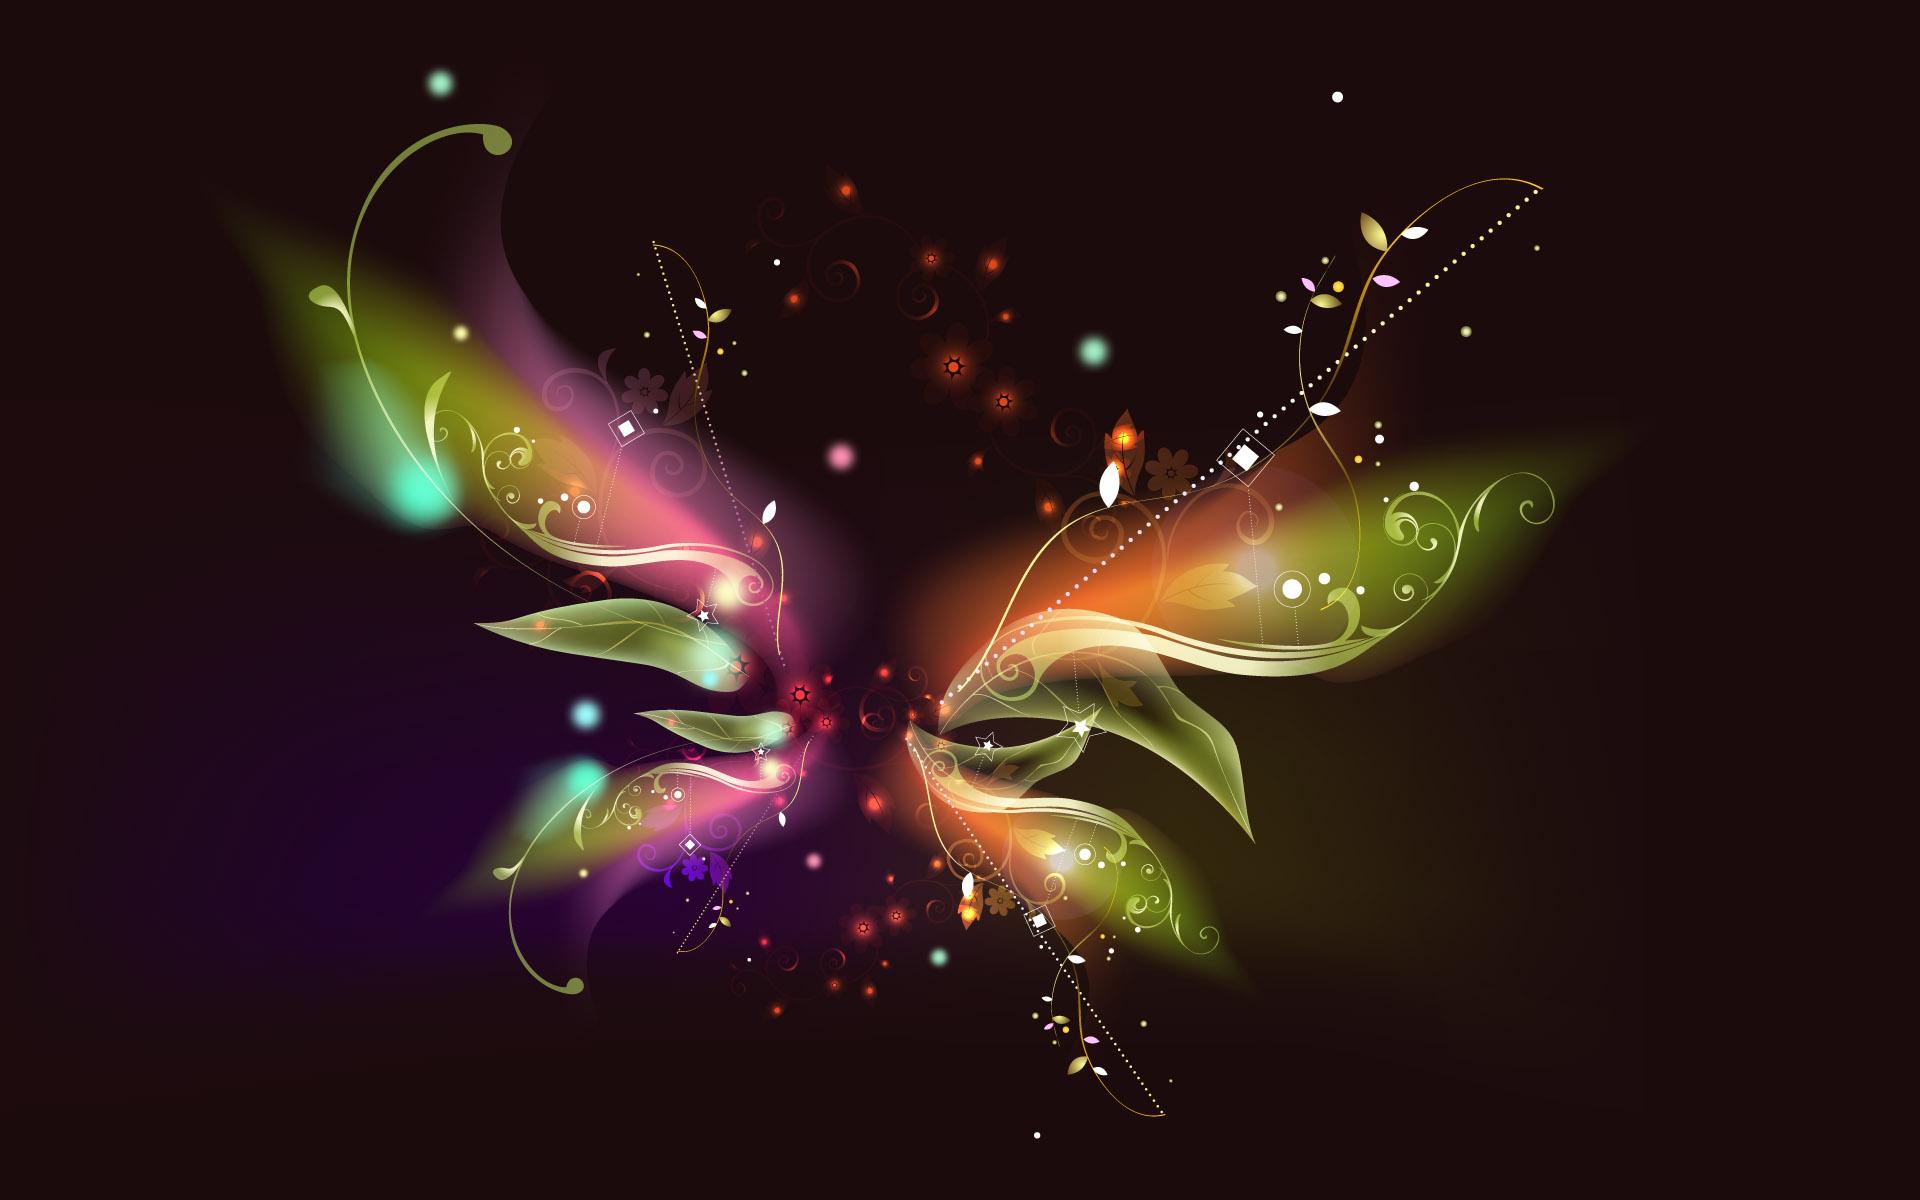 Fantasy: 3D, Abstract, CGI, Digital Art, Psychedelic, Trippy